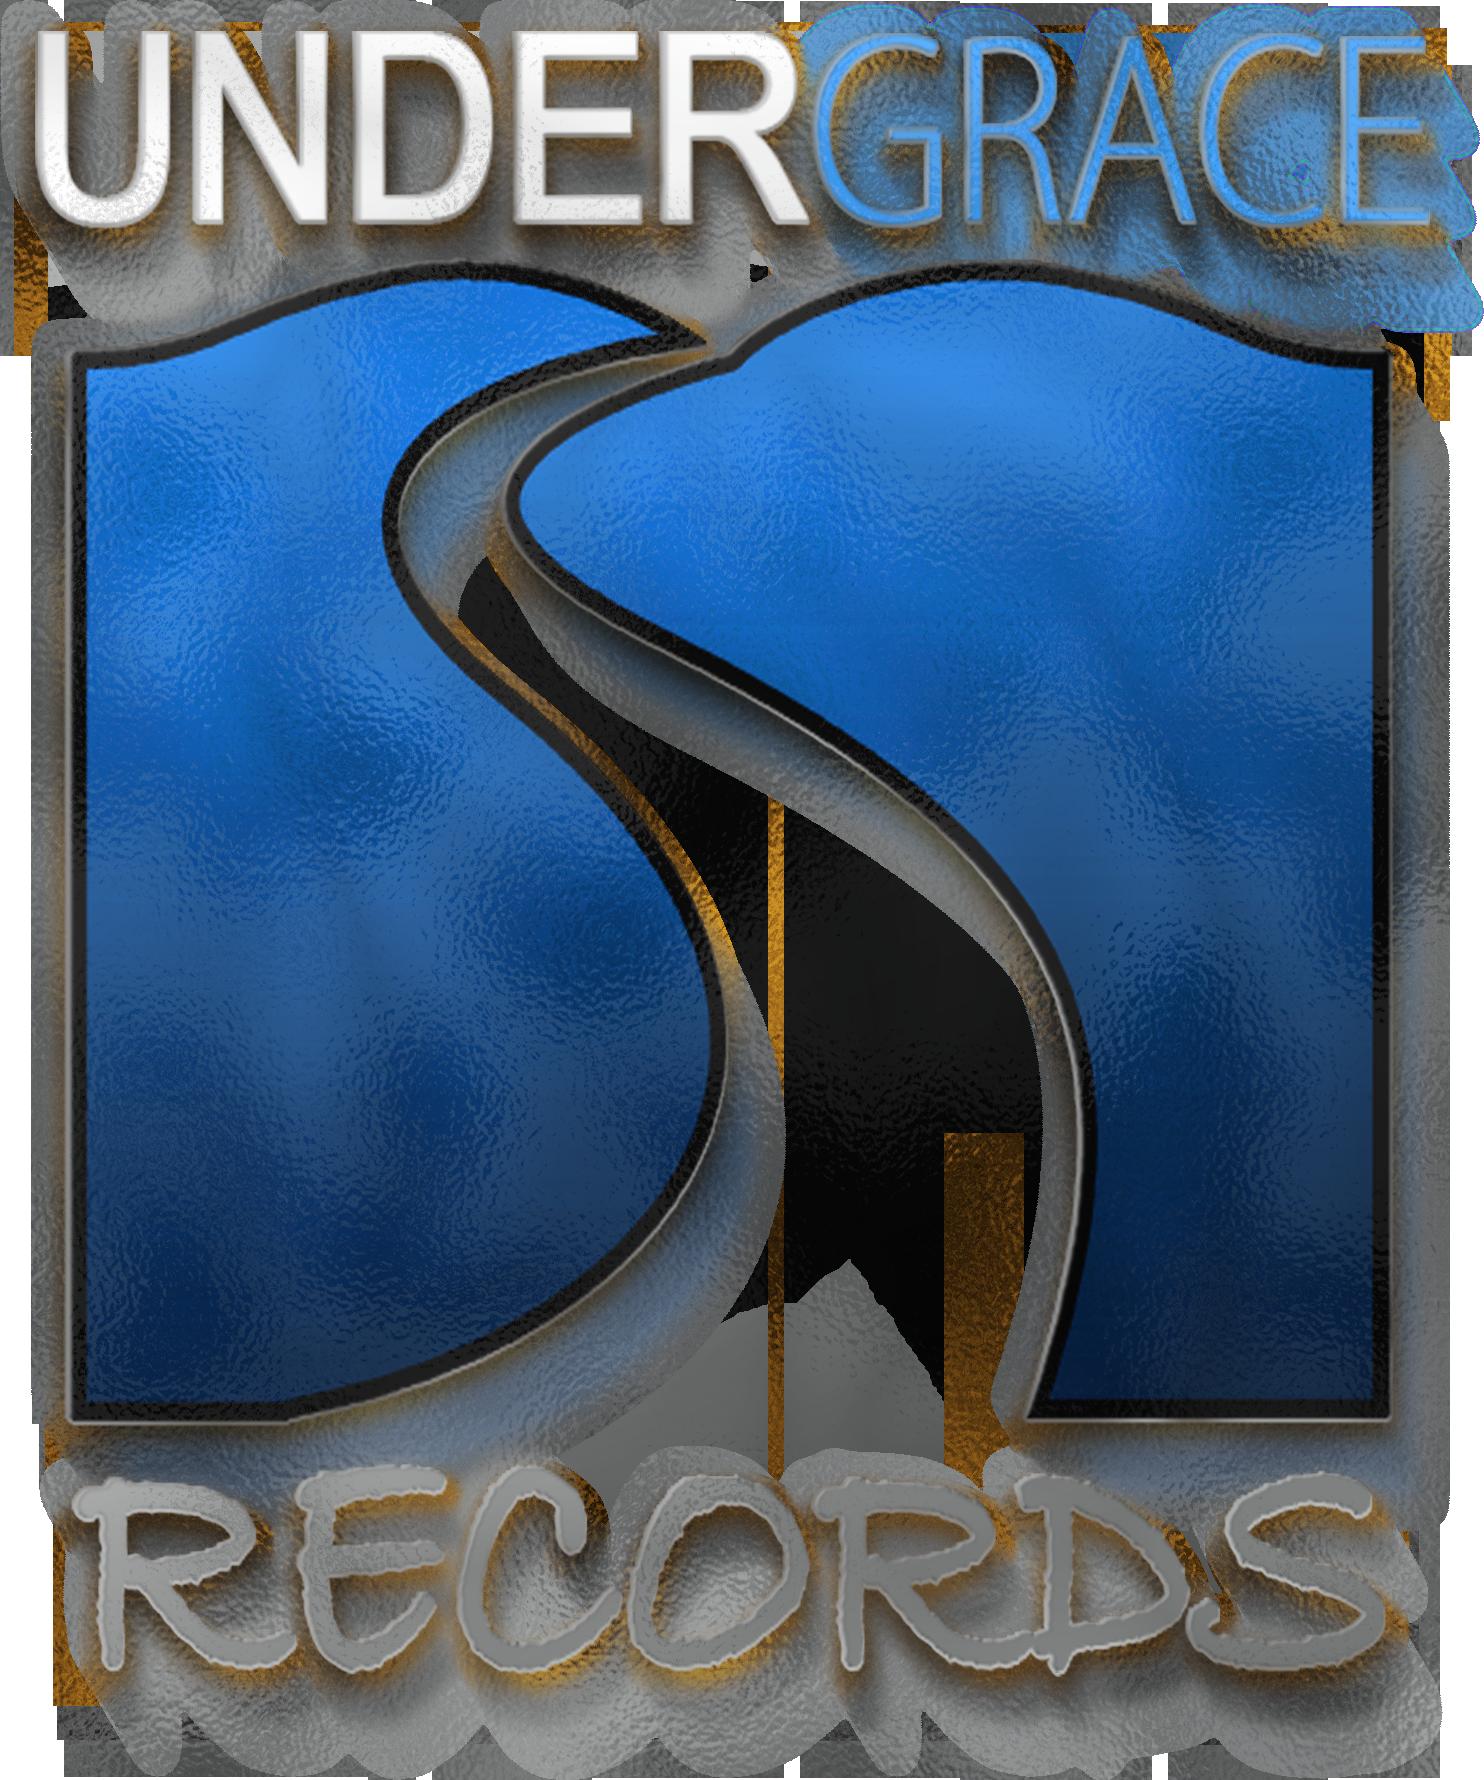 Under Grace Records